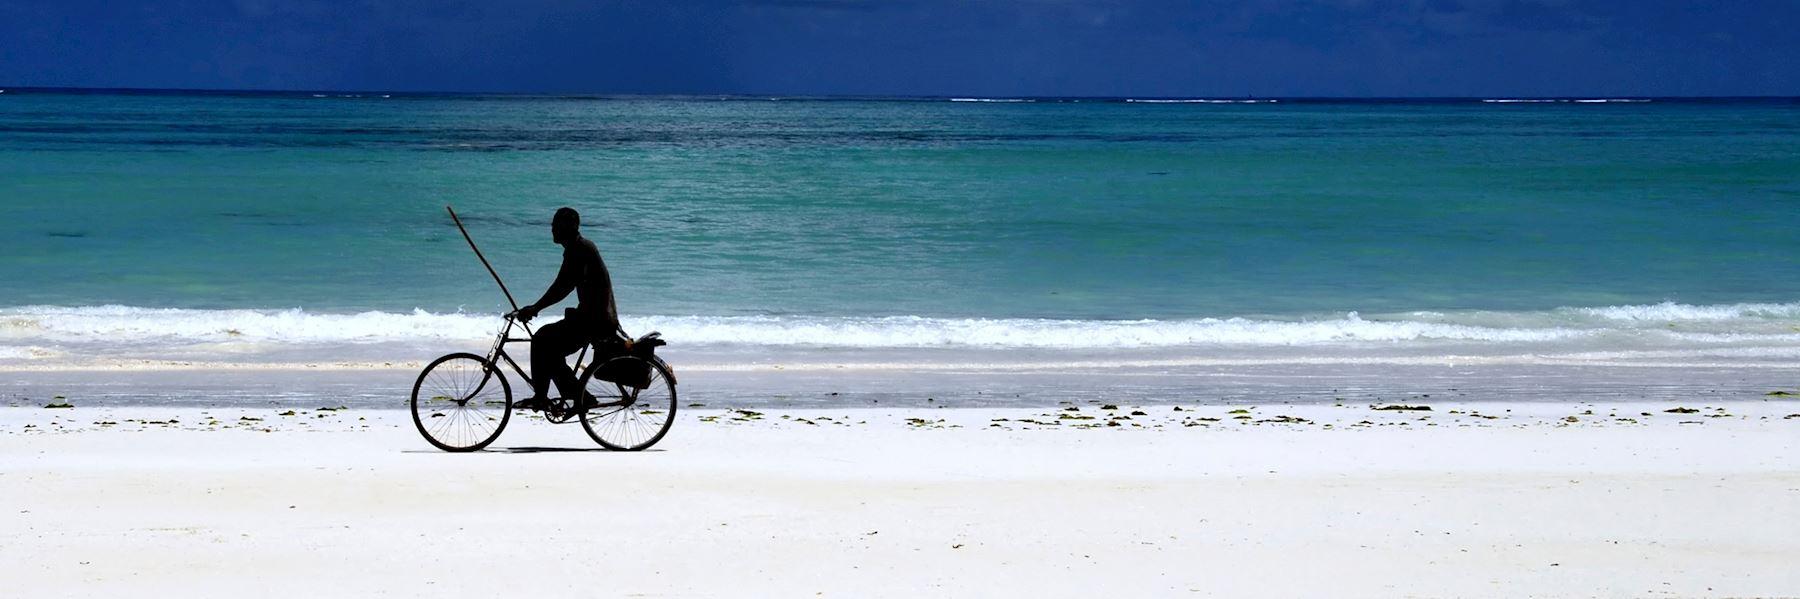 Zanzibar Archipelago vacations